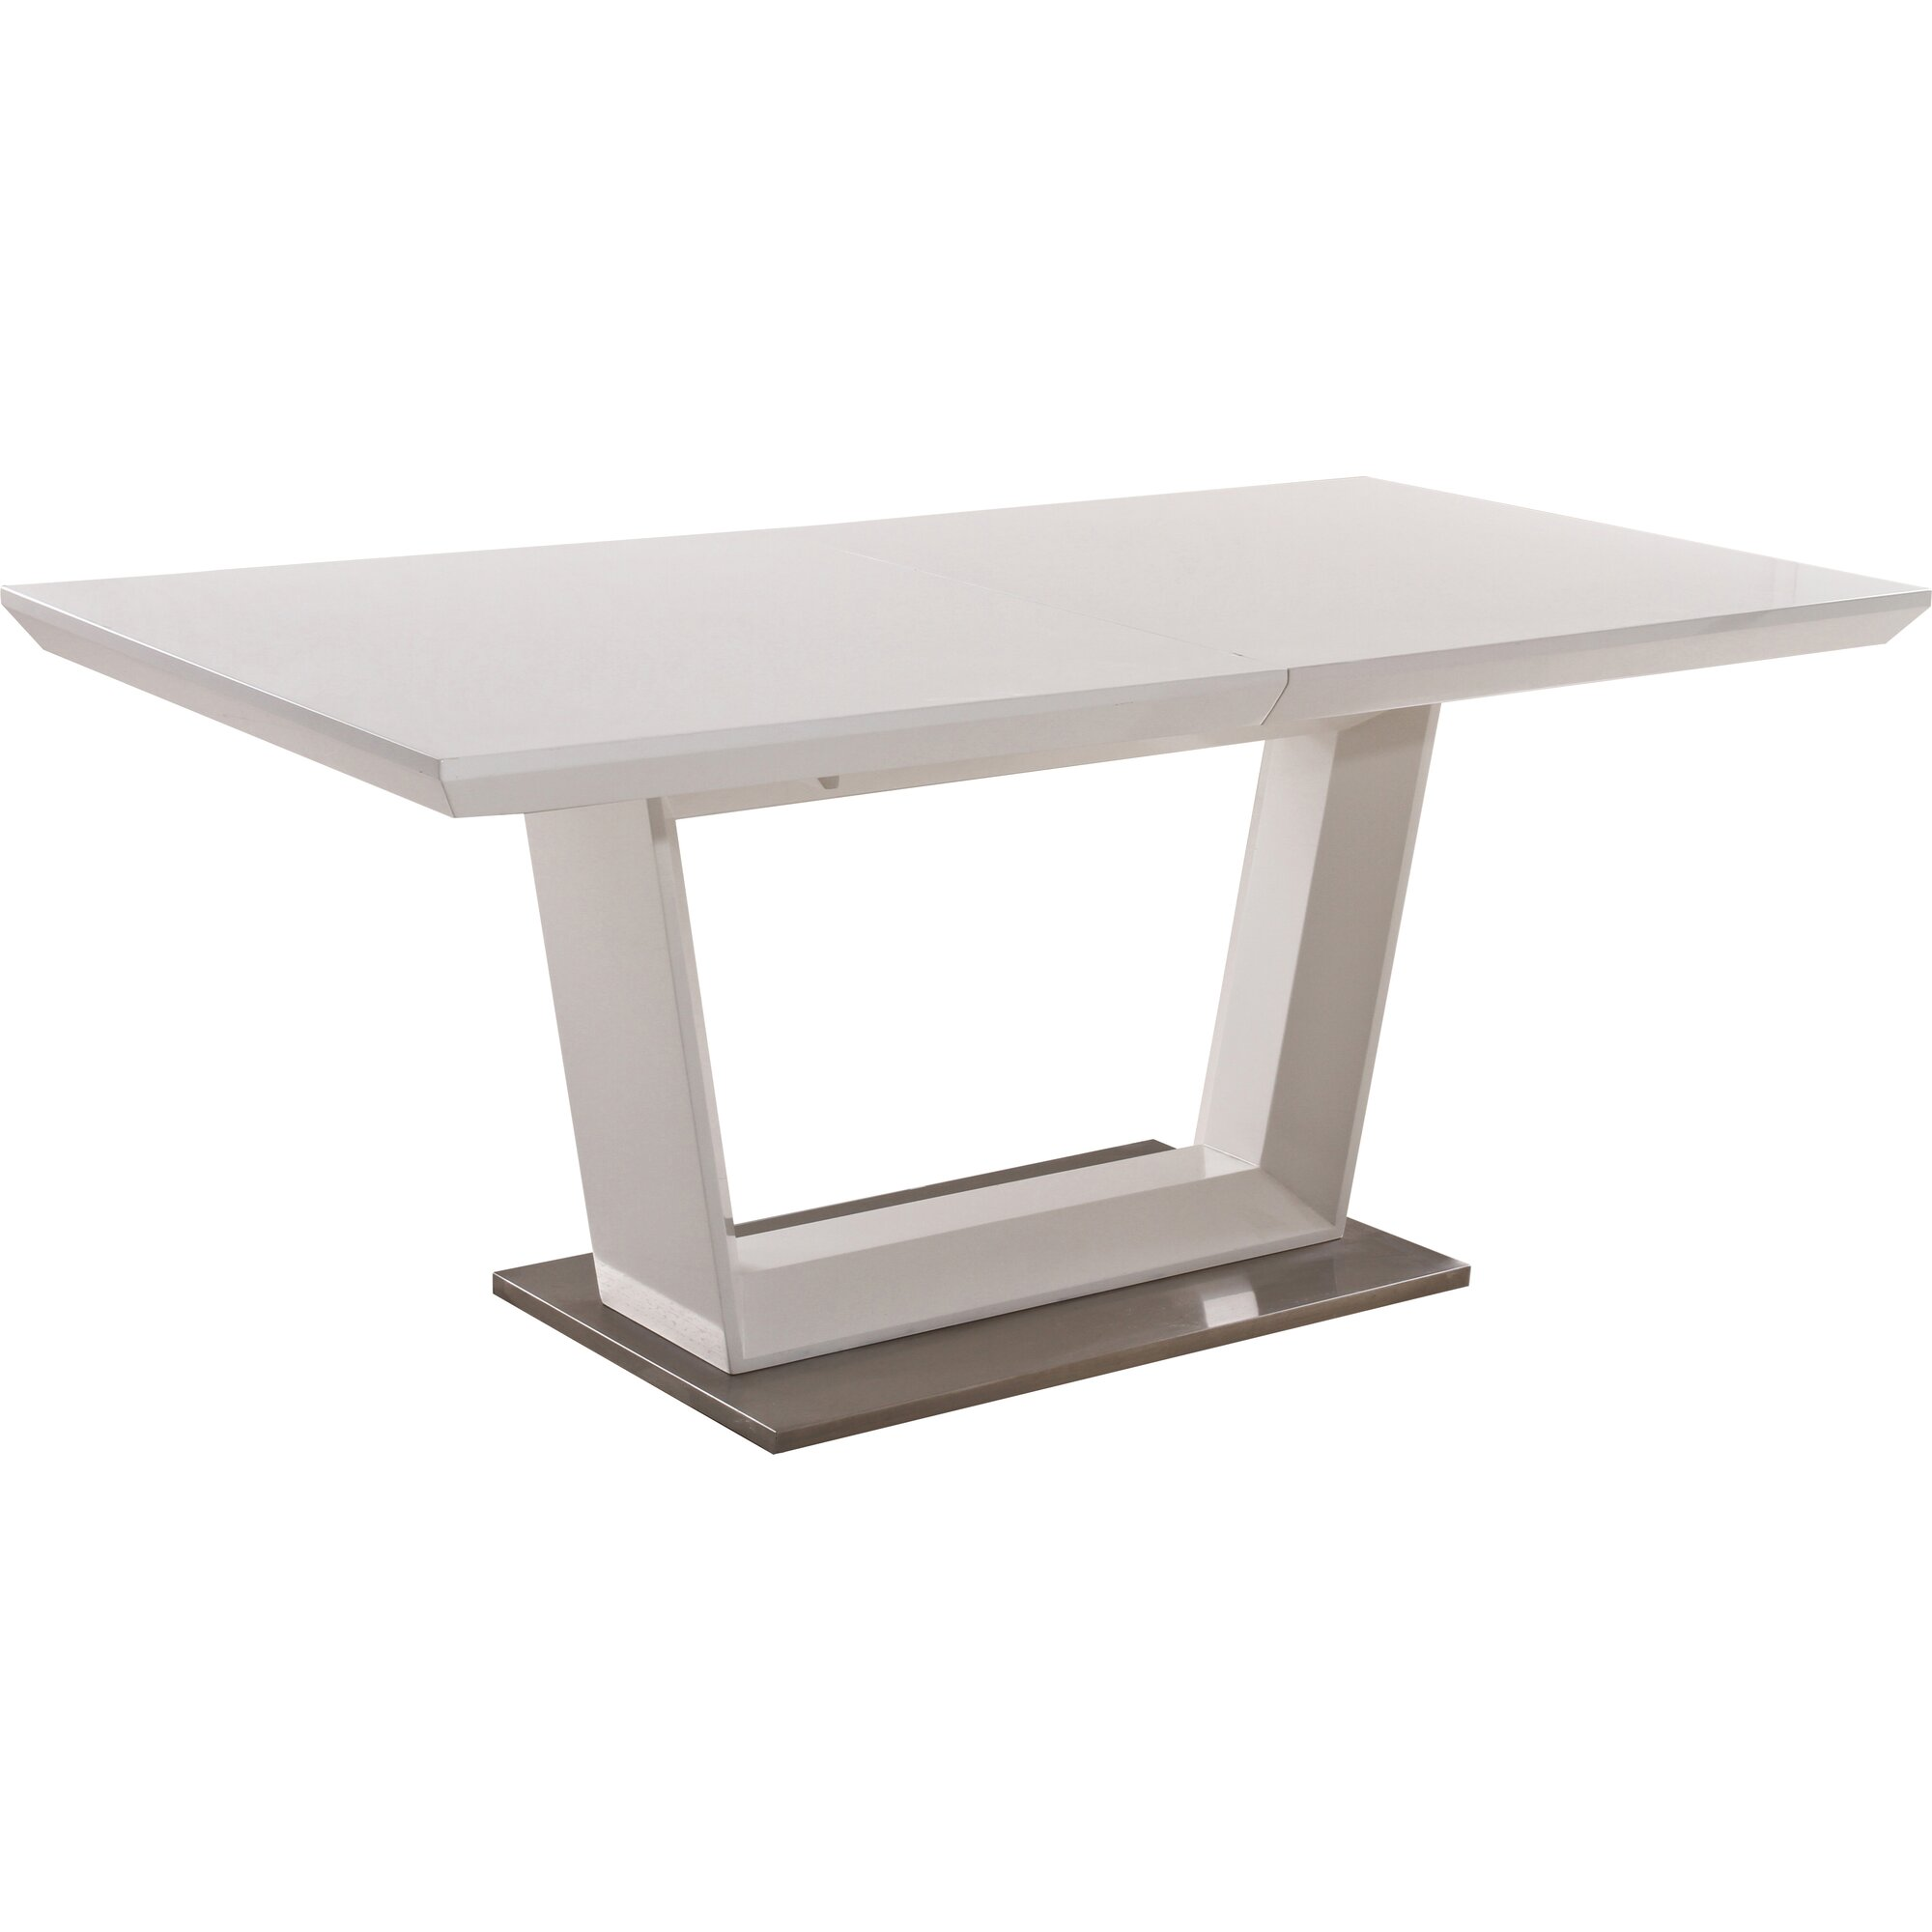 Creative Images International Extendable Dining Table  : ExtendableDiningTable from www.wayfair.com size 2000 x 2000 jpeg 84kB